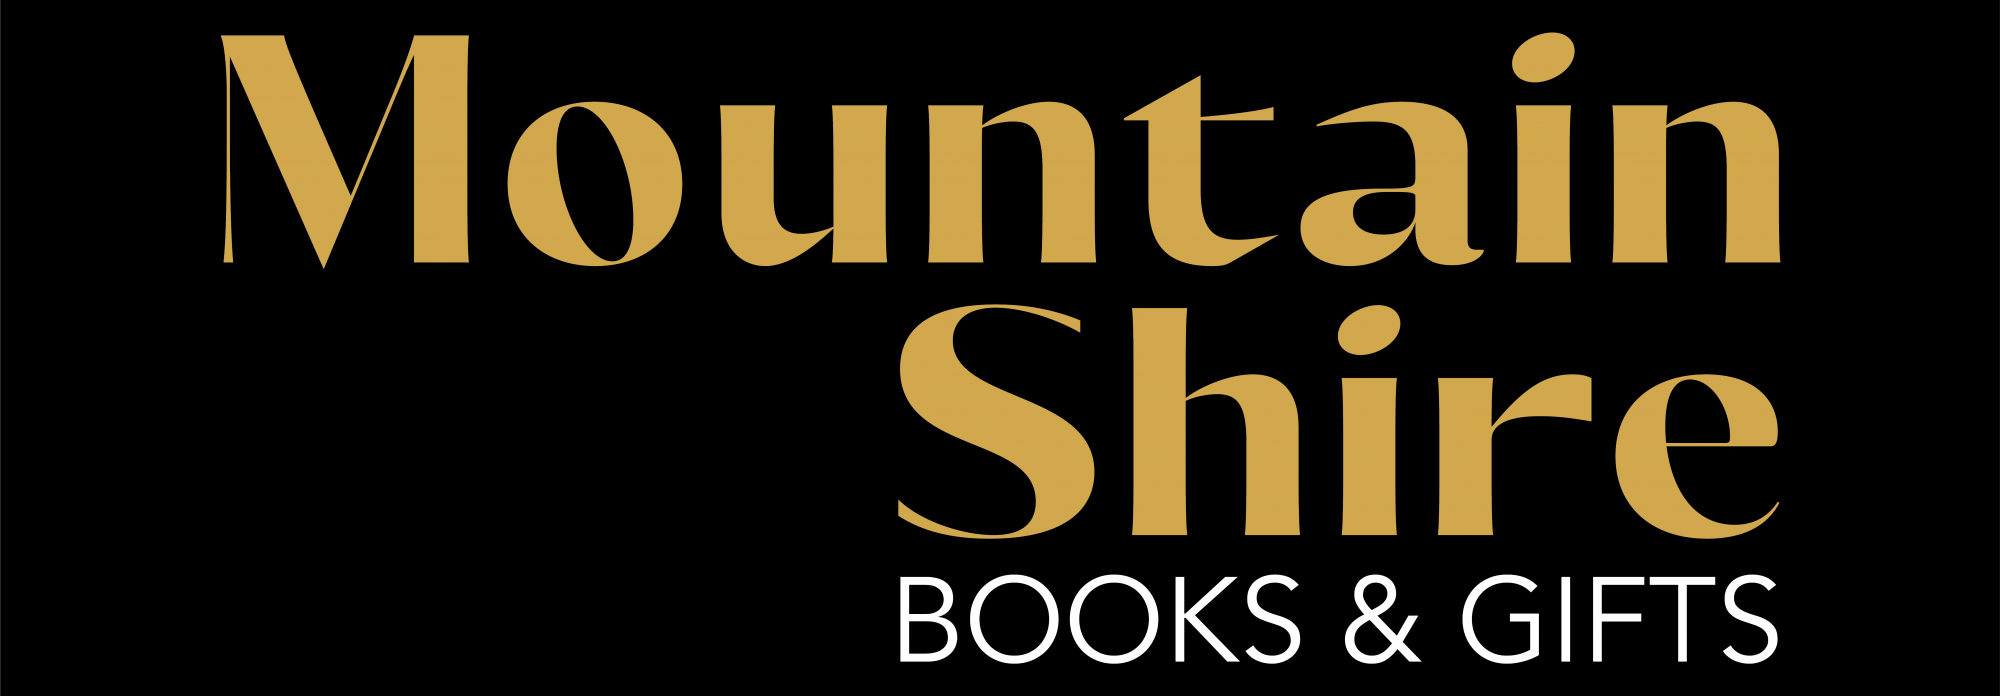 cropped-MountainShireBooksGifts_Final_Vert-1-1.png